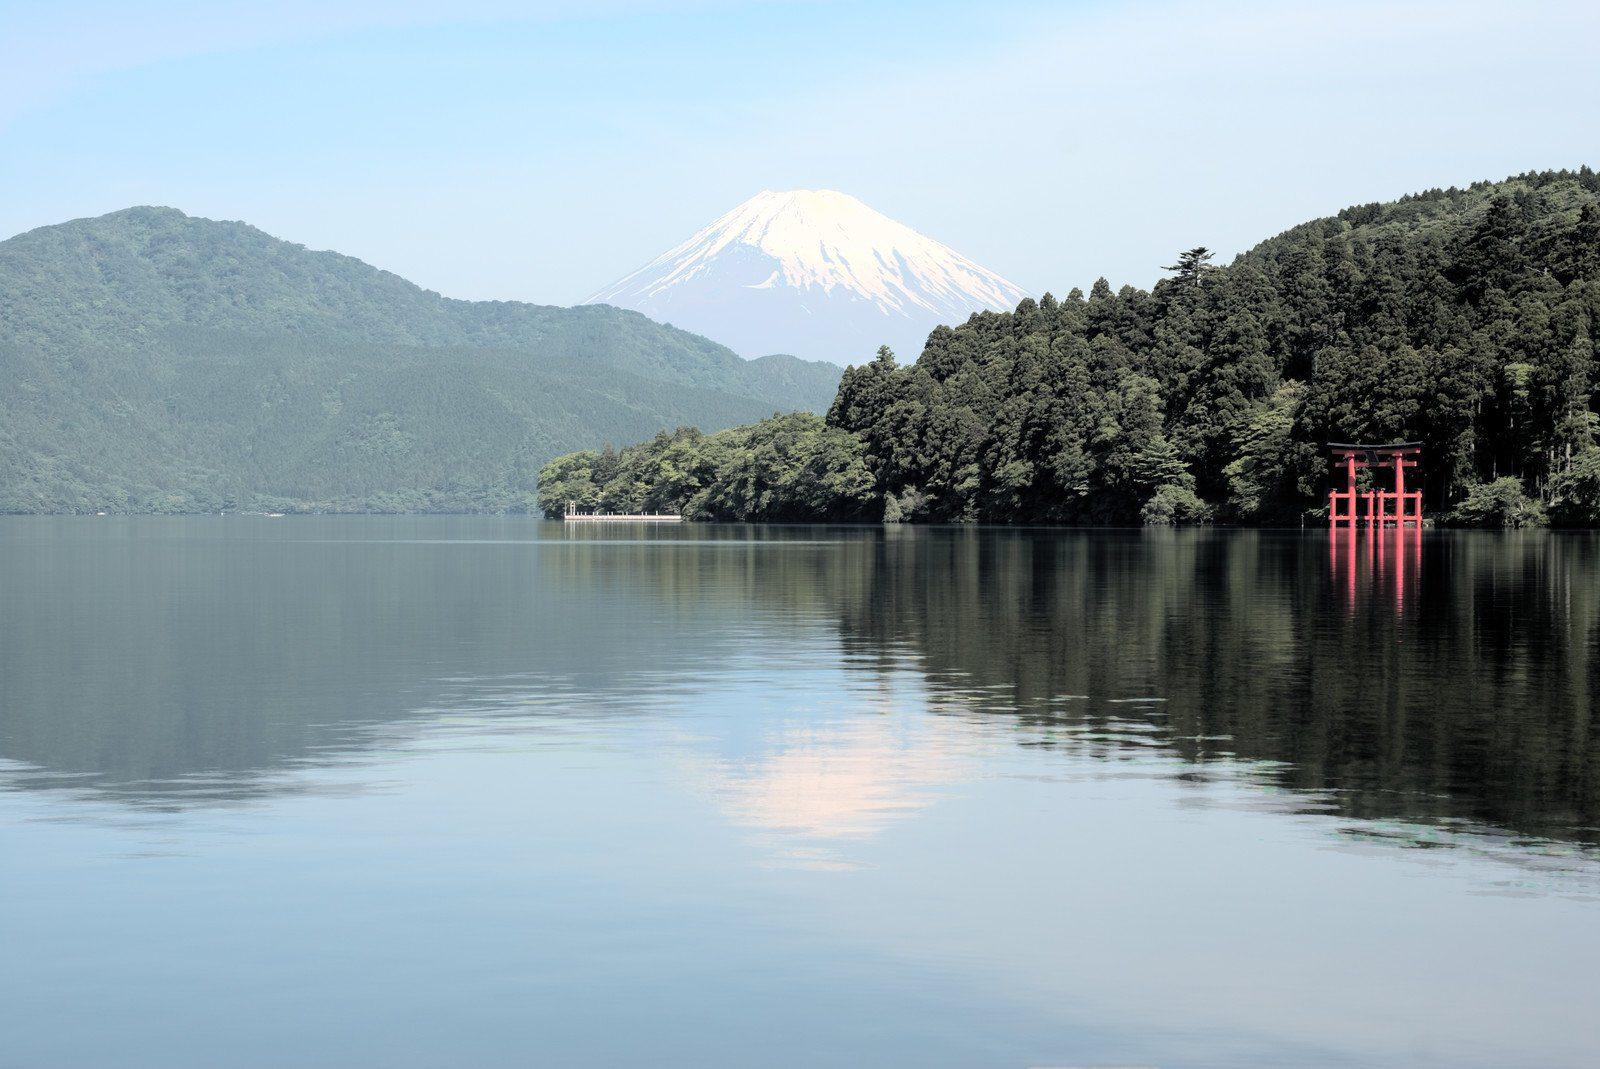 View of Mt Fuji from Mt Ashi in Hakone